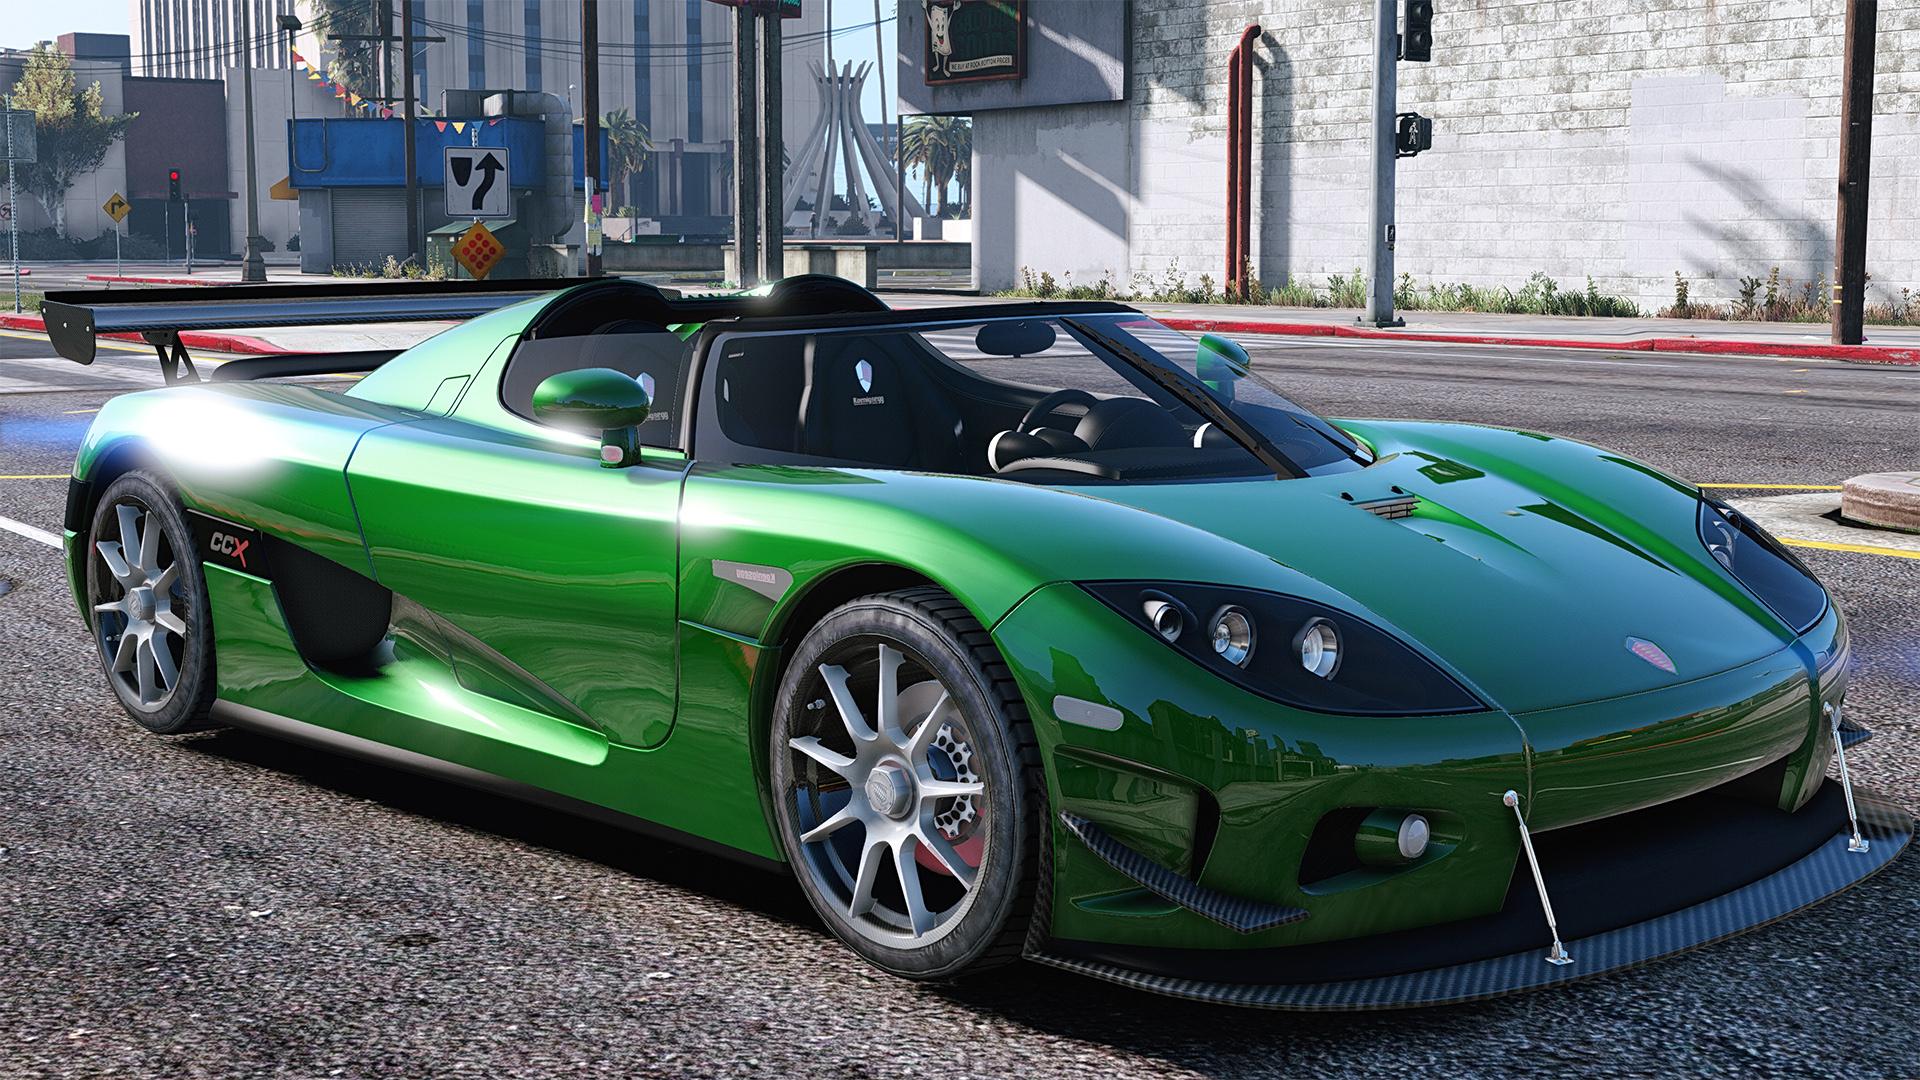 2006 Koenigsegg CCX [Autovista] [Add-On / Replace | Tuning] - GTA5-Mods.com